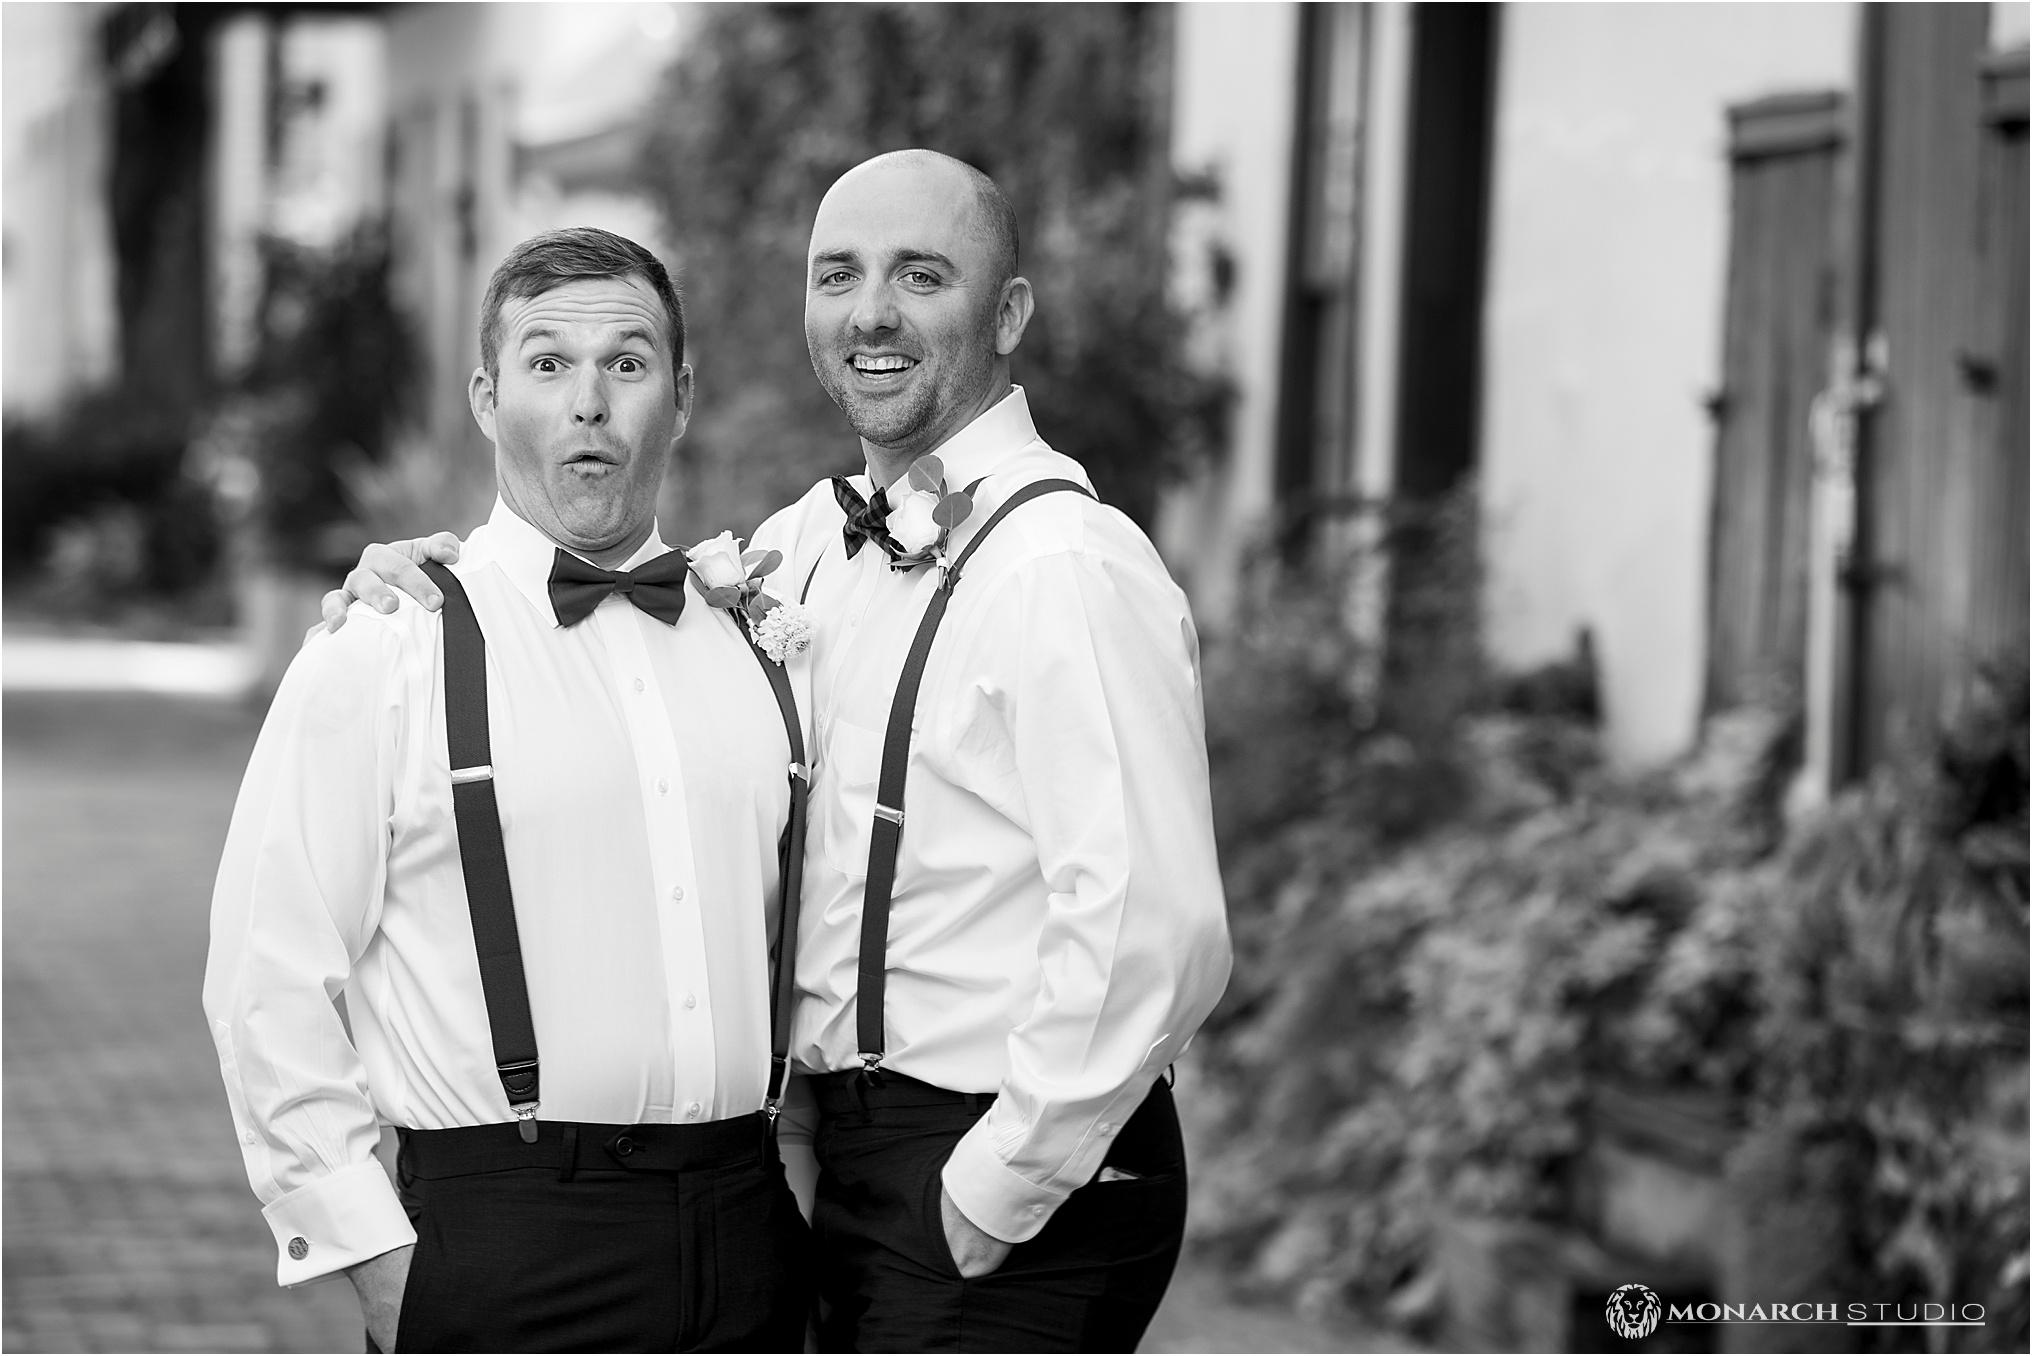 033-whiteroom-wedding-photographer-2019-05-22_0015.jpg